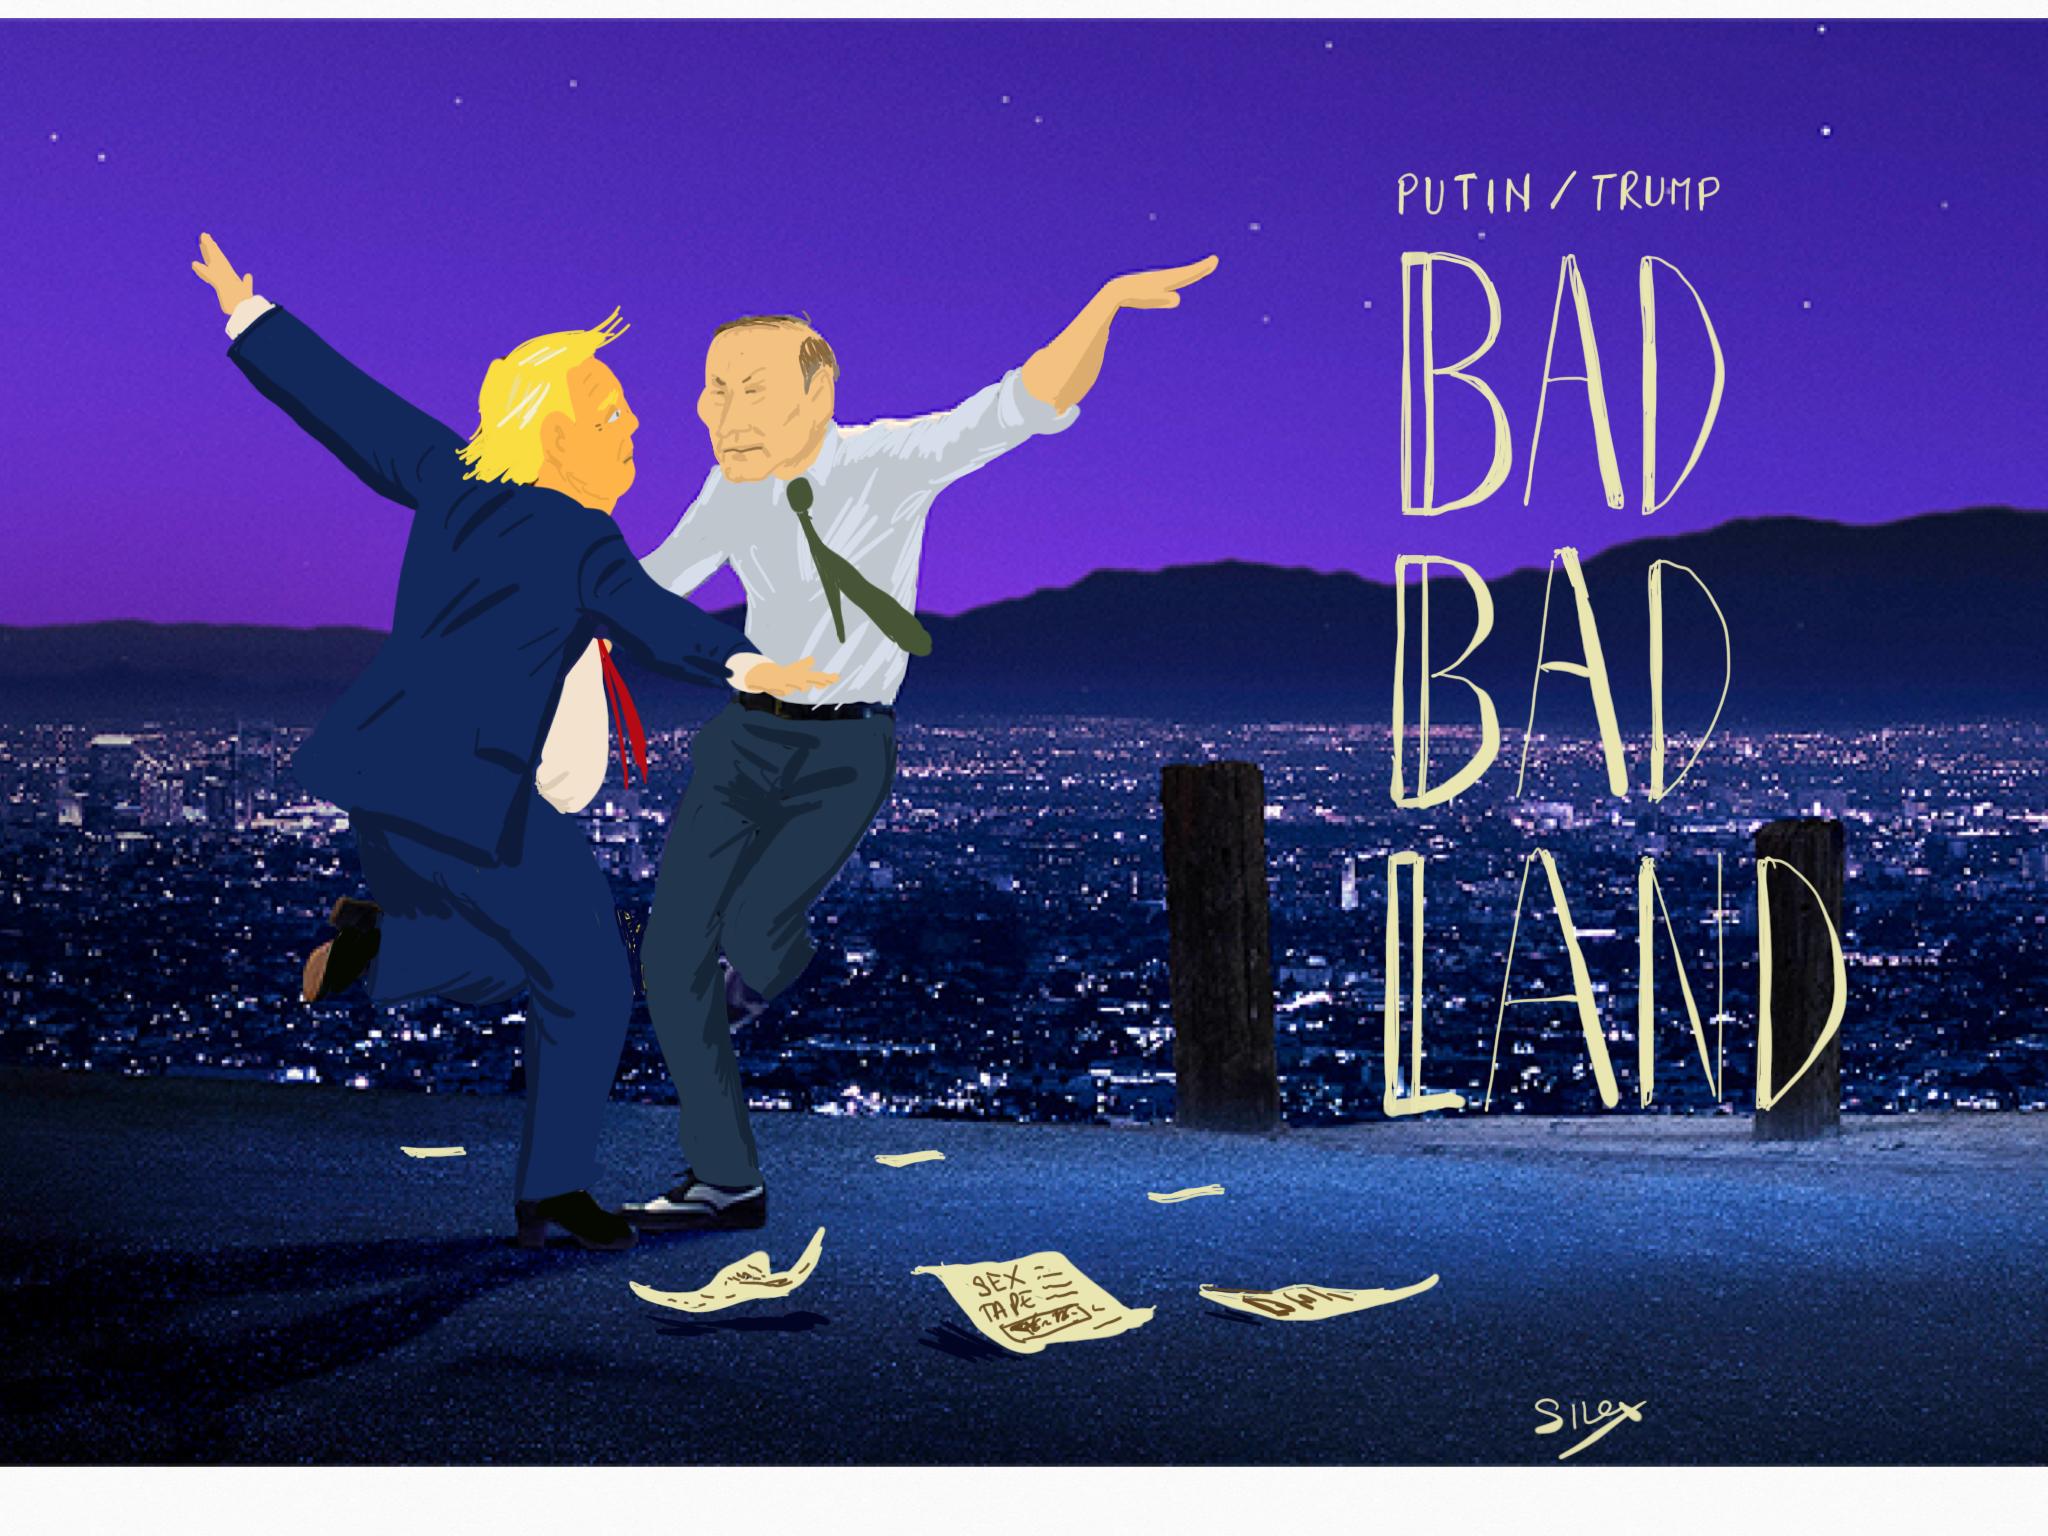 BAD BAD LAND